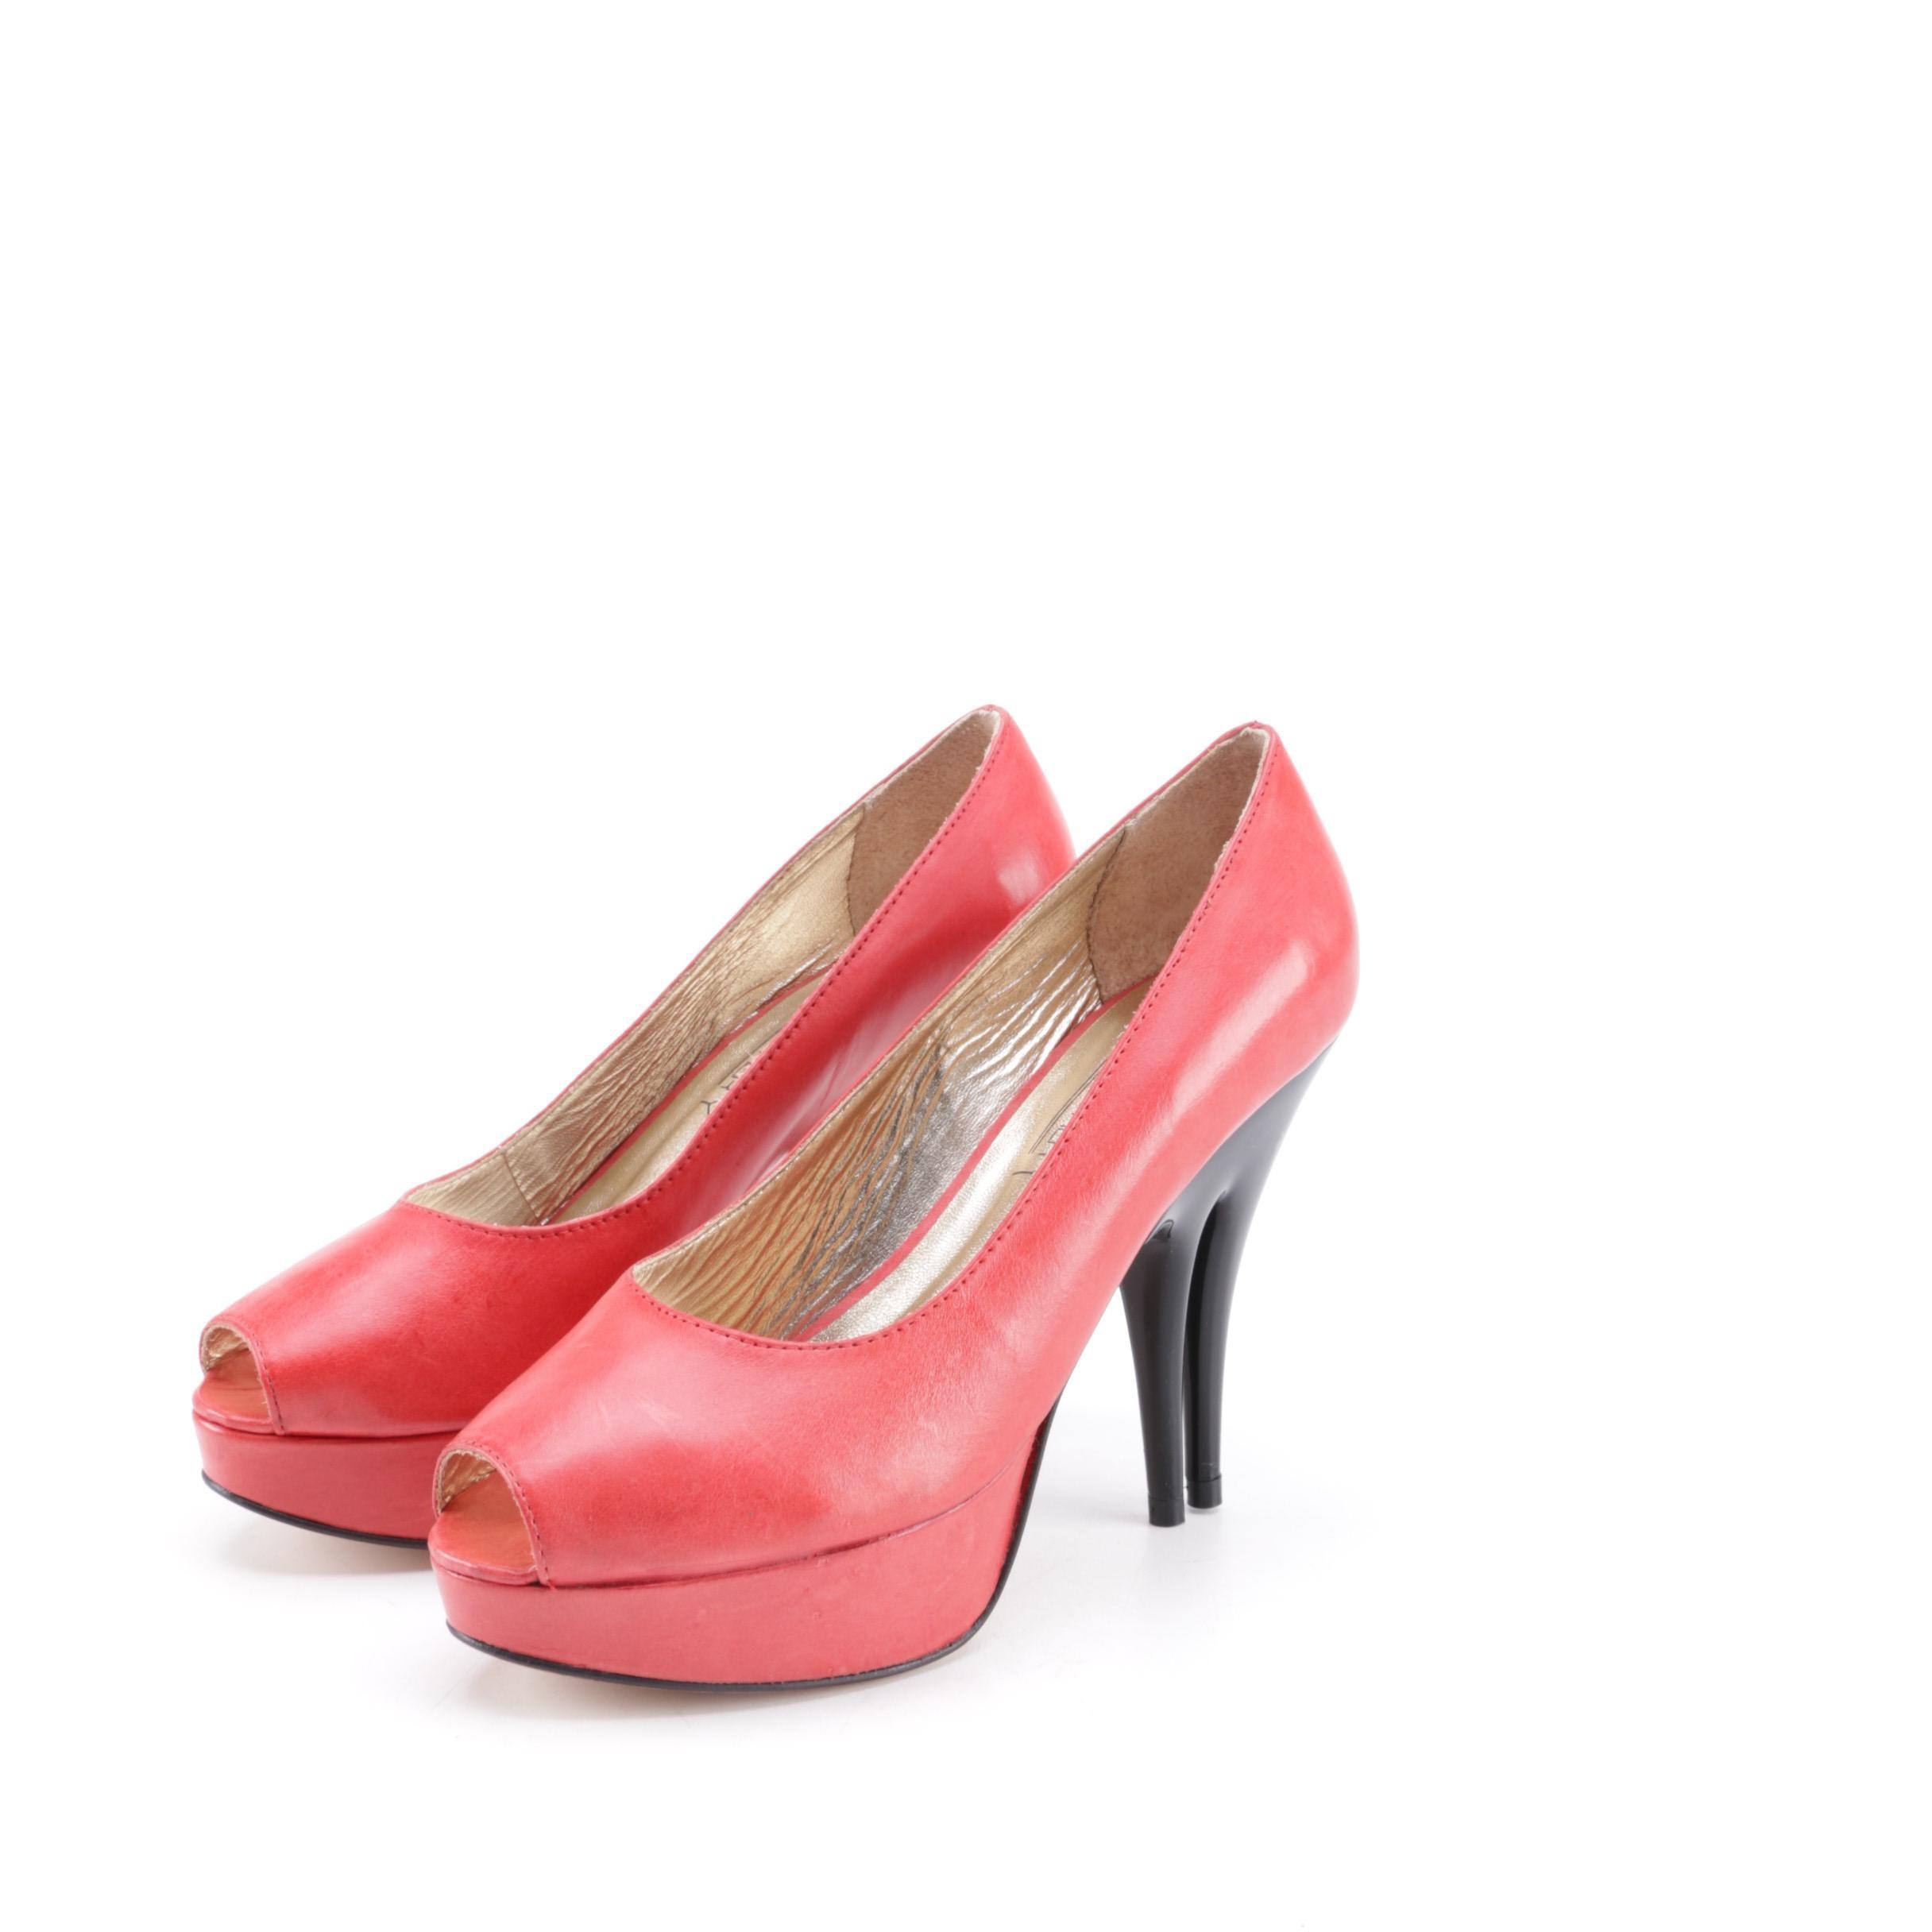 Christopher Coy Collection Prototype Peep-Toe Dual-Heel Stilettos